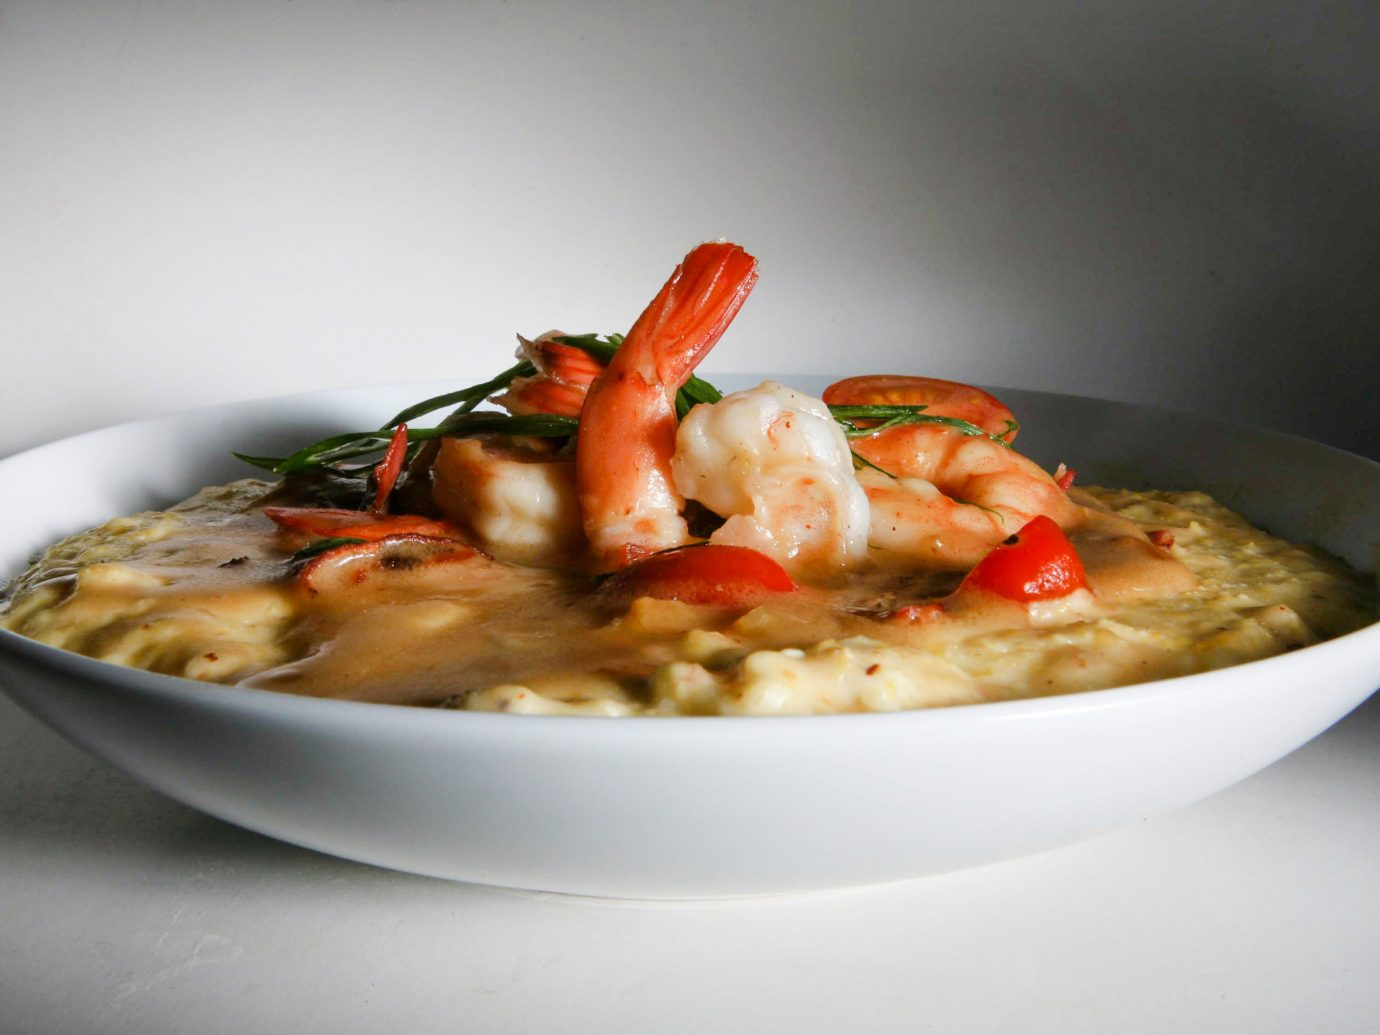 Food + Drink food plate dish indoor cuisine bowl risotto Seafood vegetarian food thai food recipe italian food soup